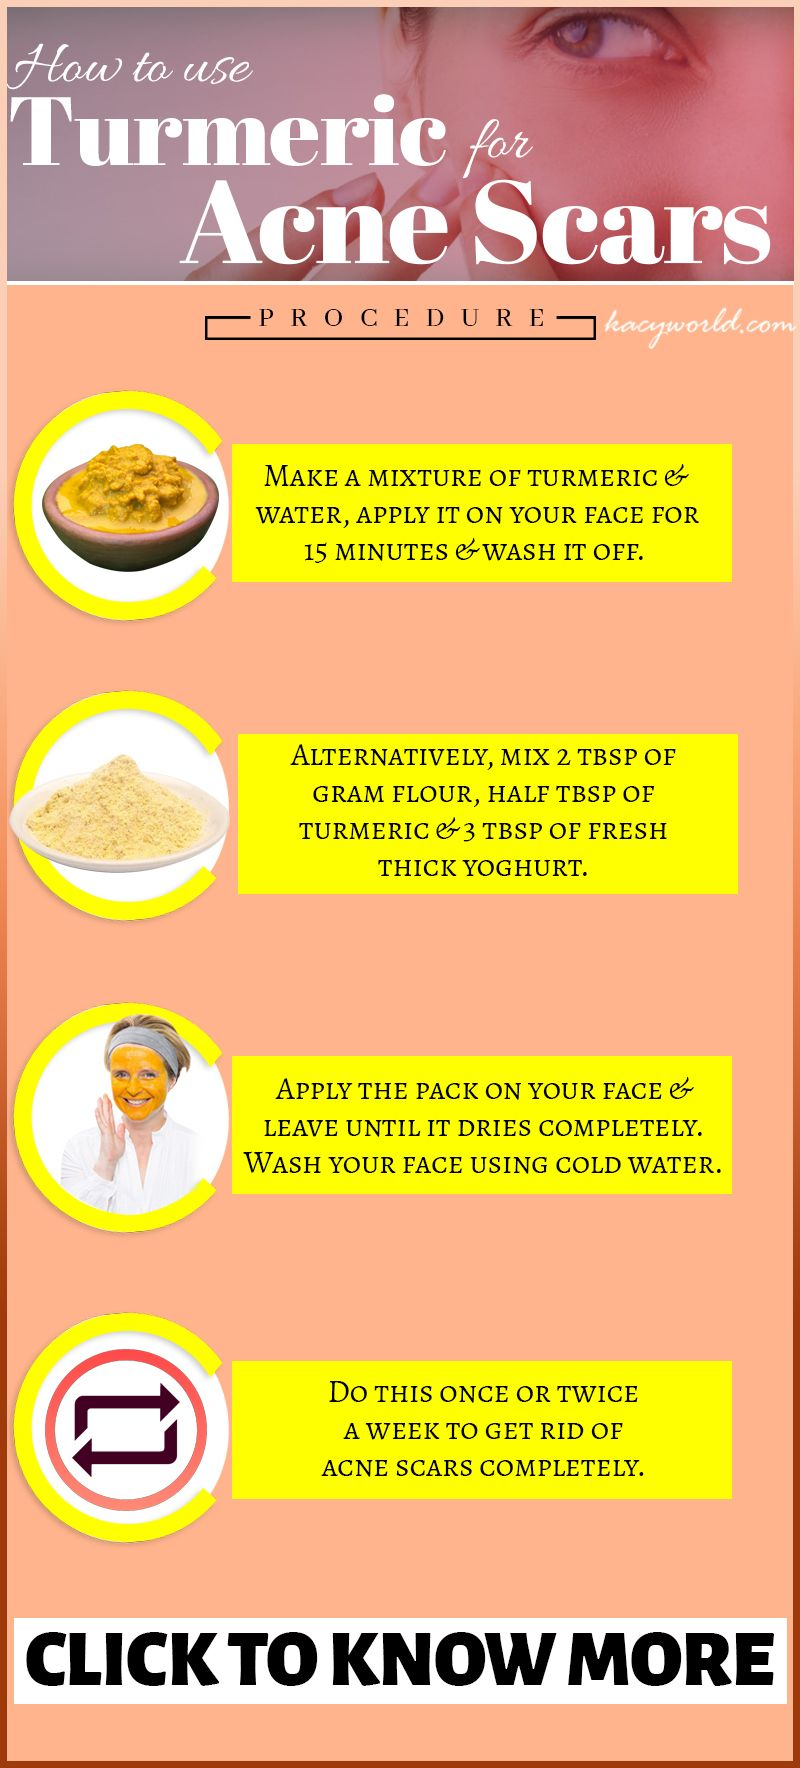 10 Major Benefits Of Turmeric Powder For Skin Kacyworld Com Turmeric Powder Benefits Turmeric Skin